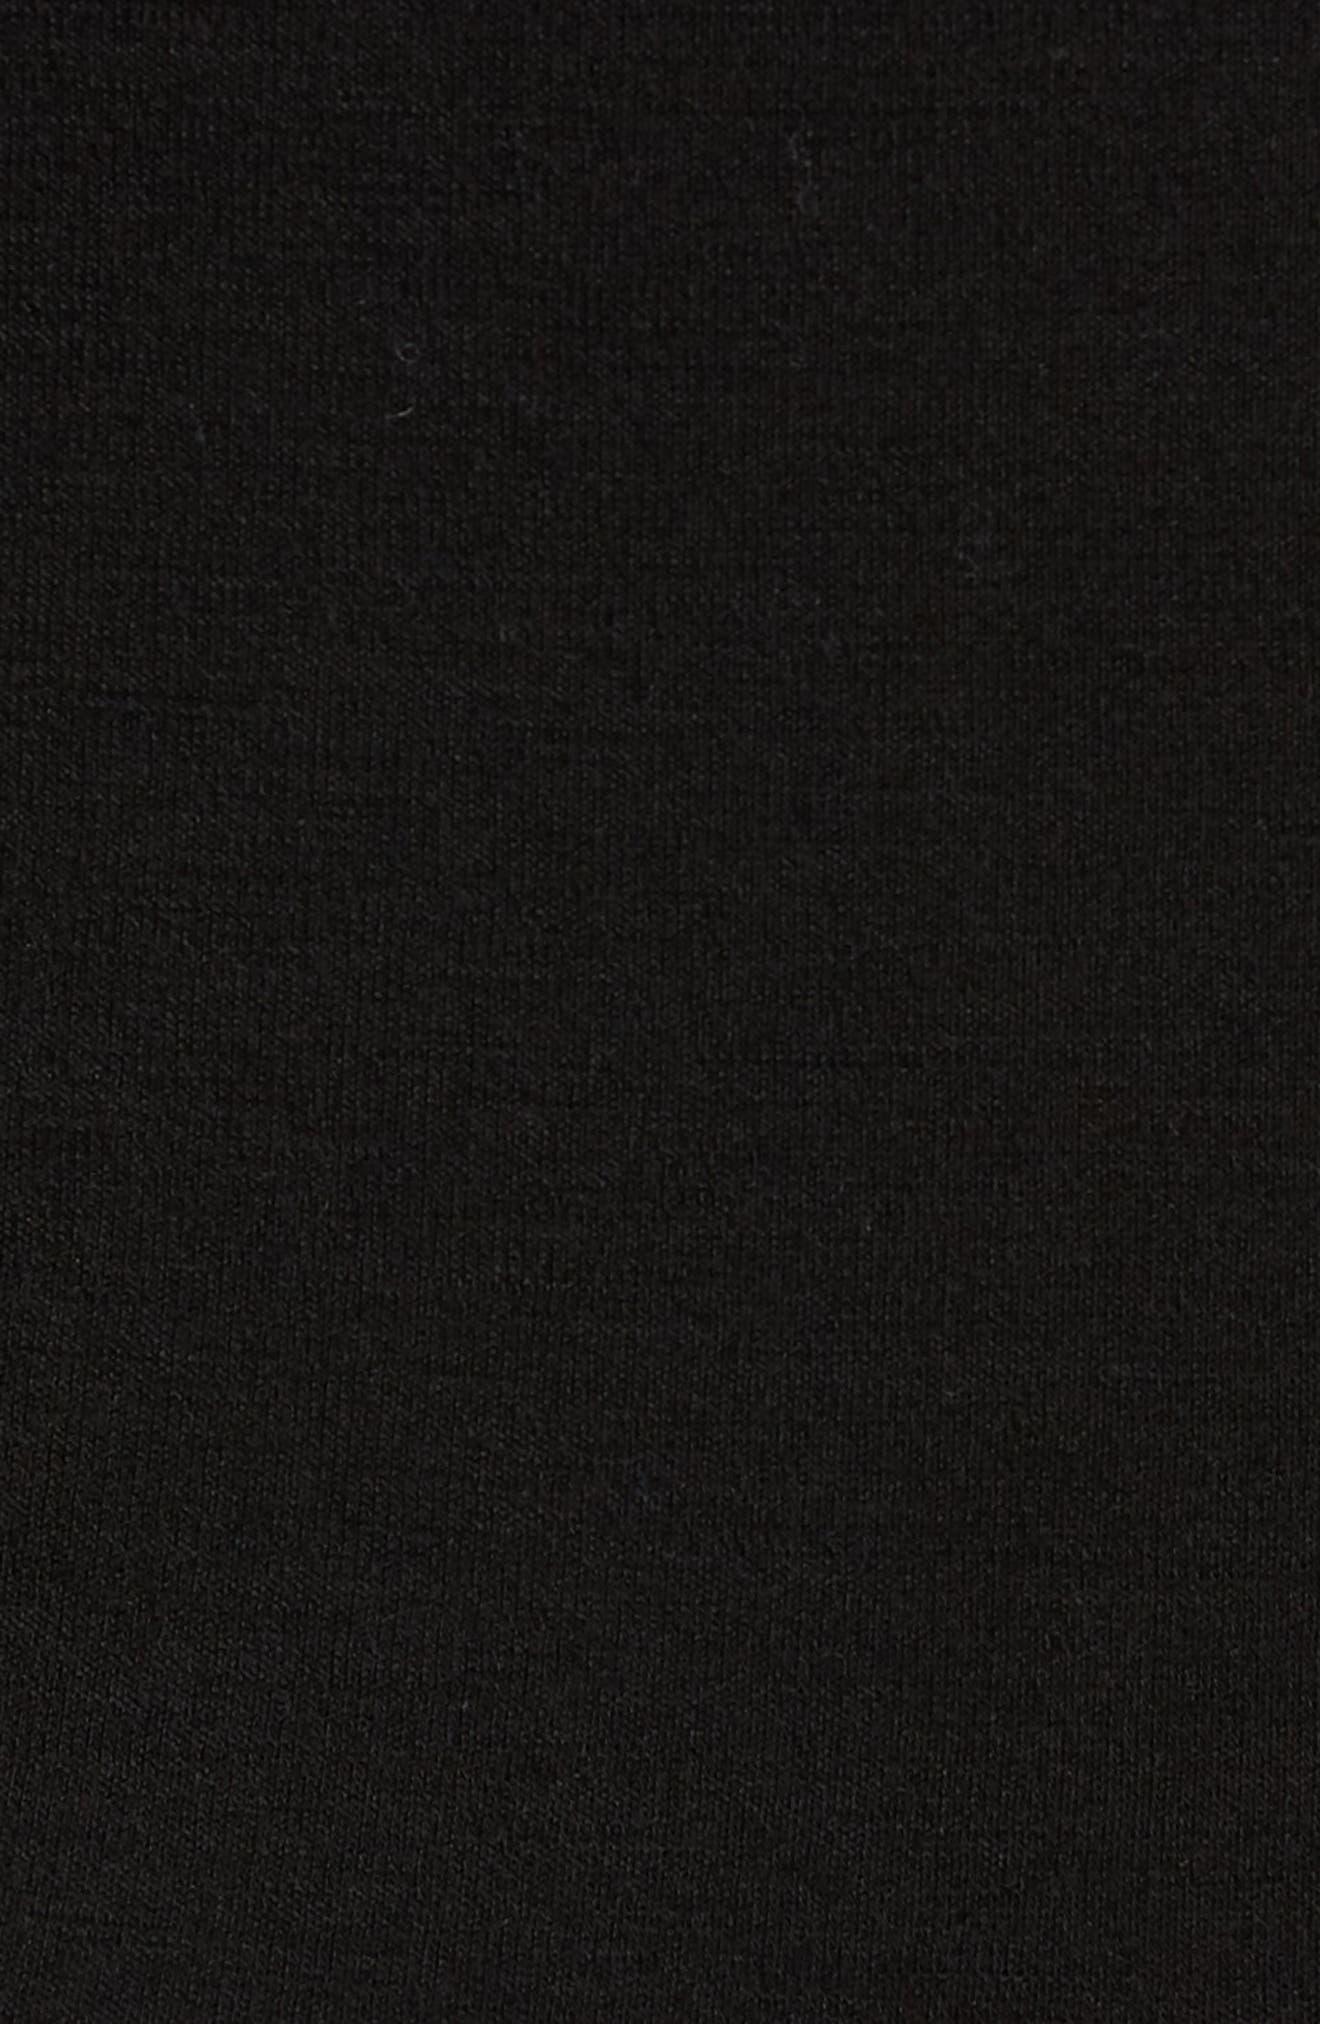 Merino 250 Base Layer Hooded Pullover,                             Alternate thumbnail 5, color,                             001